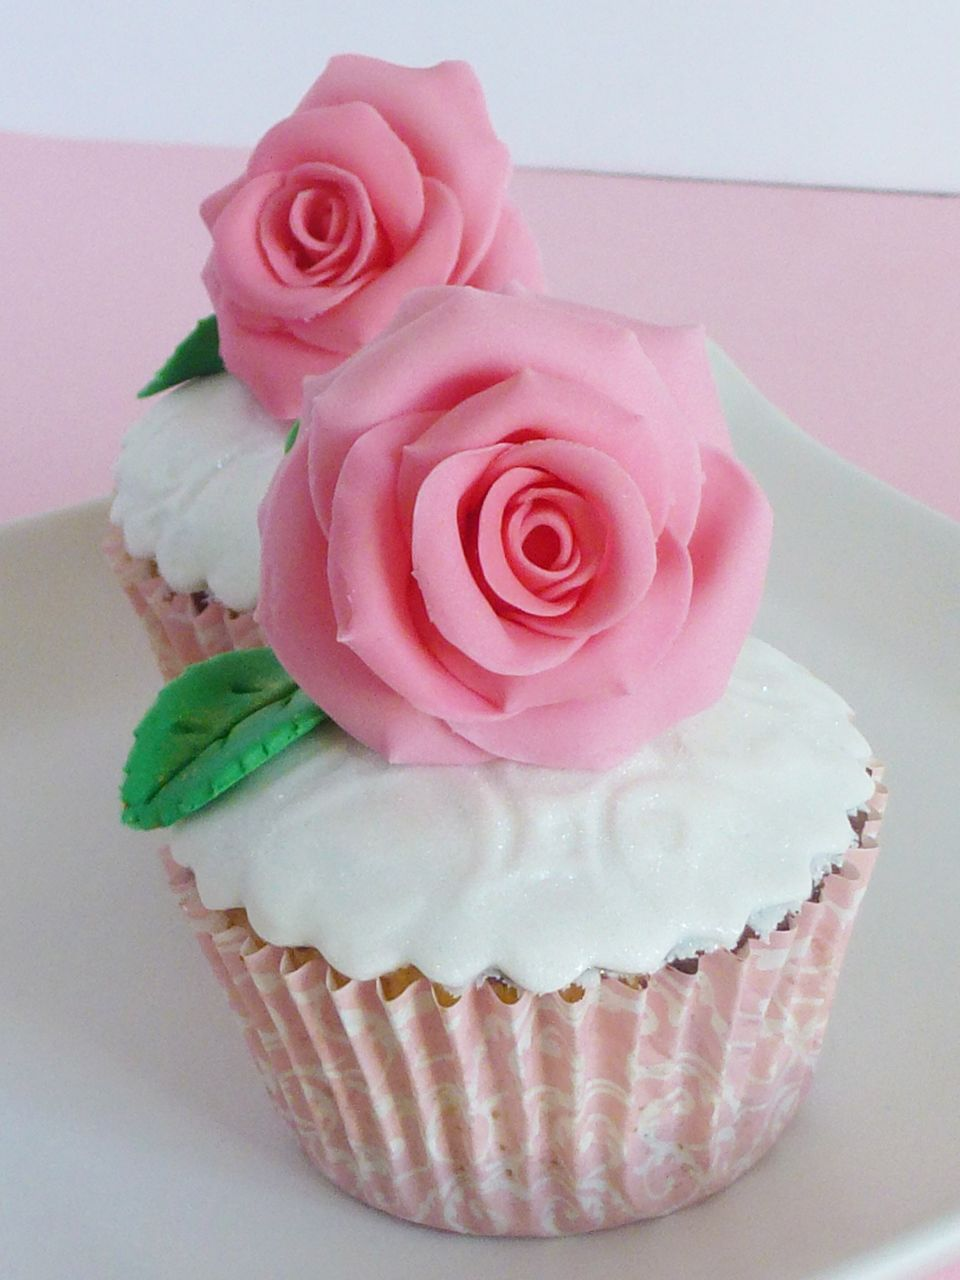 2013-12-04 11h45m33s CupcakeRosaBaja